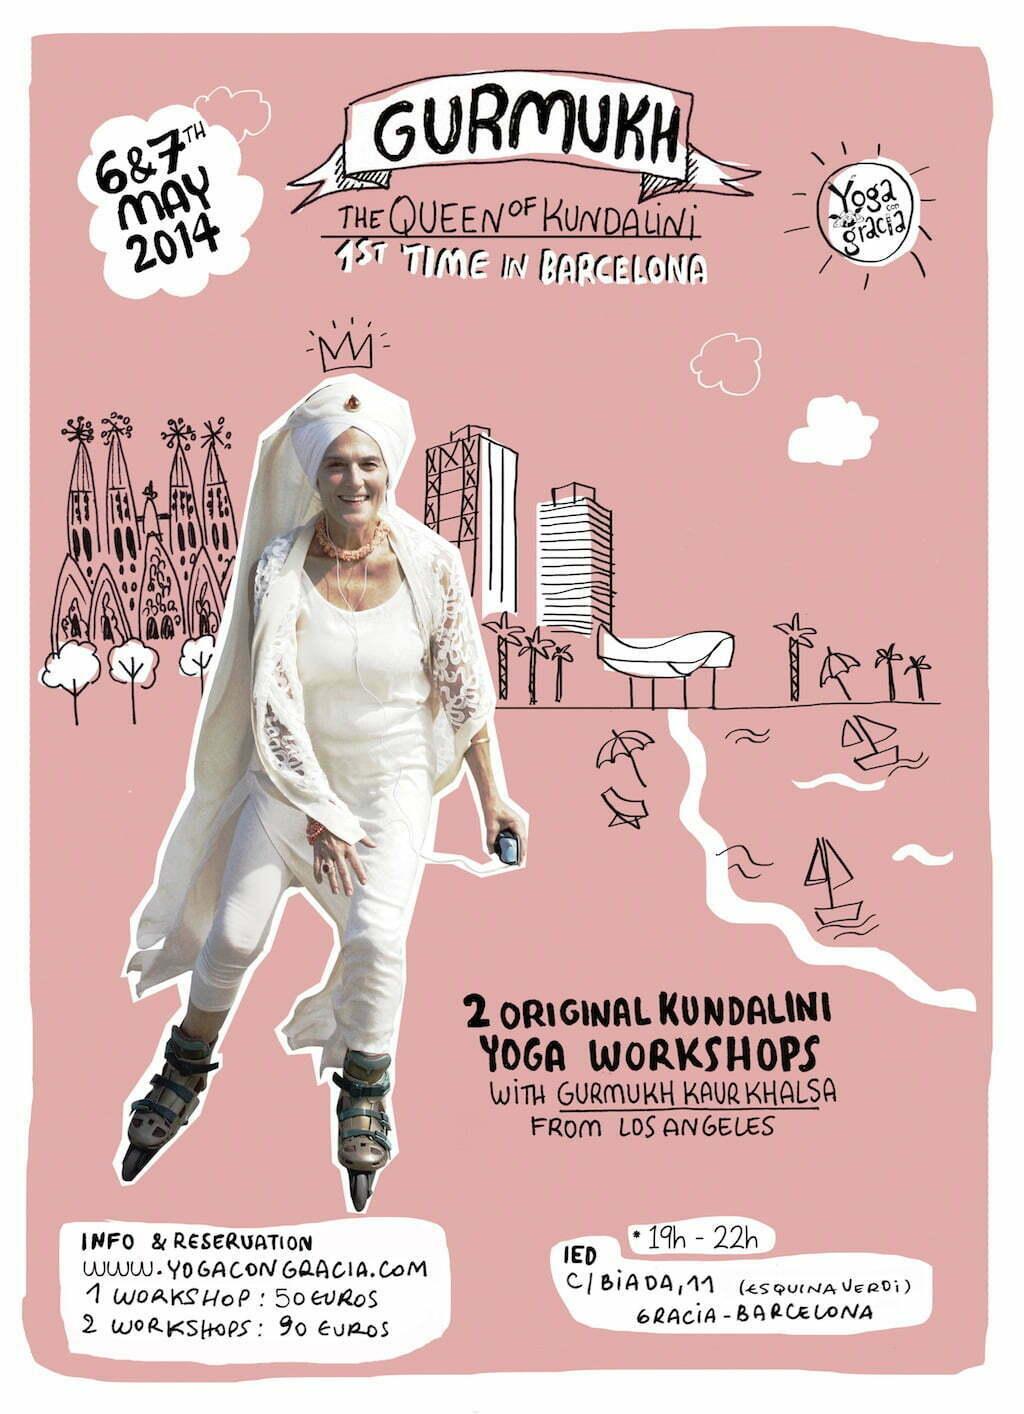 Gurmukh, the Queen of the Kundalini Yoga, Barcelona | Yoga network